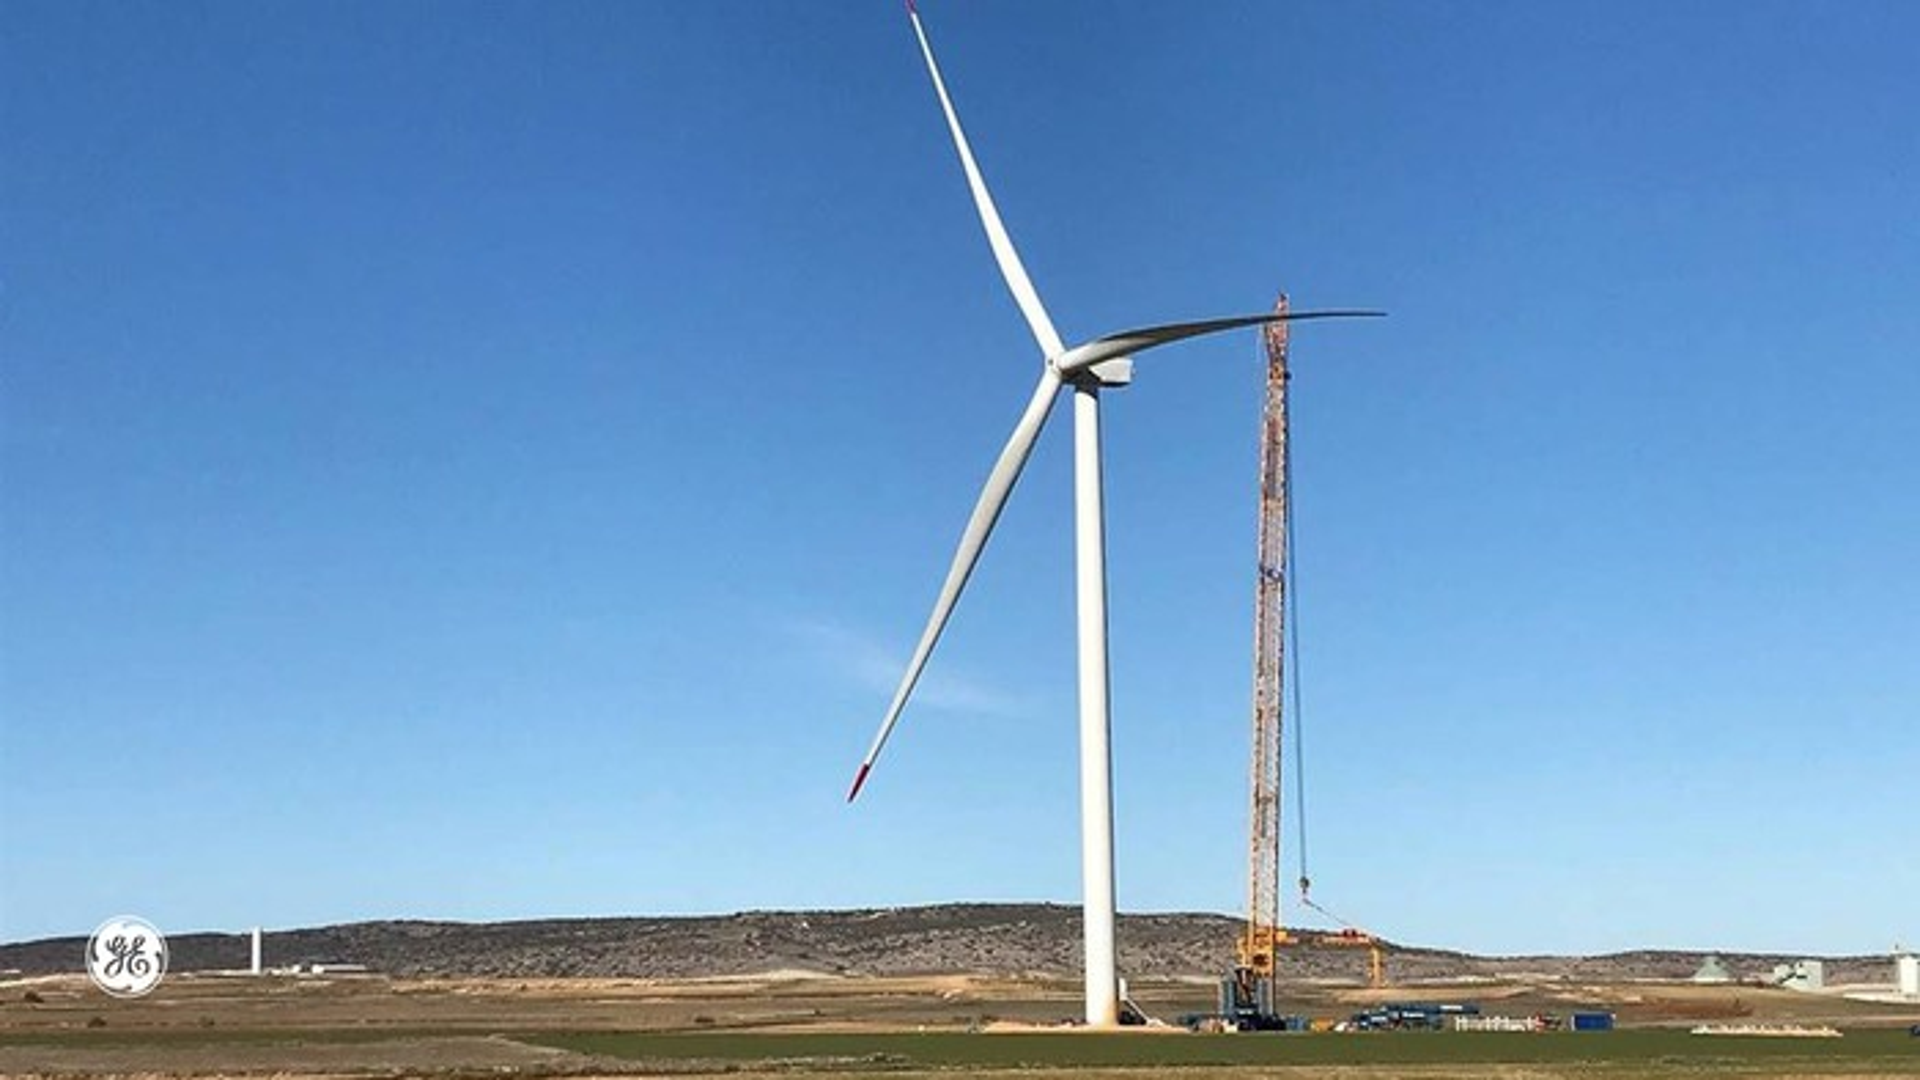 A GE-made wind turbine.